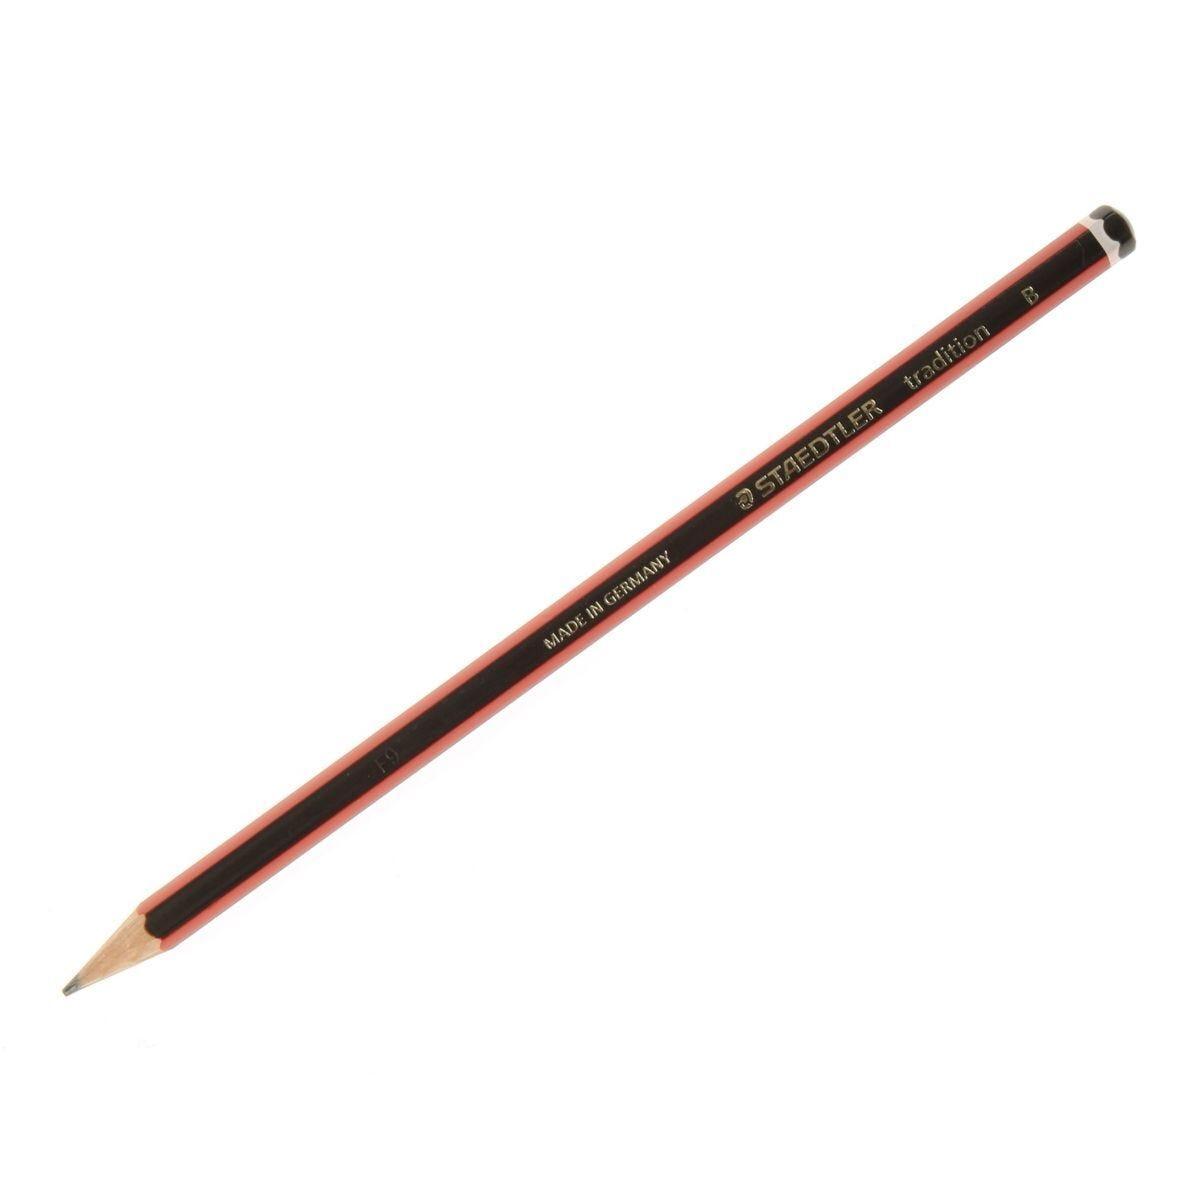 Staedtler Tradit Pencil 110 B Pack of 12